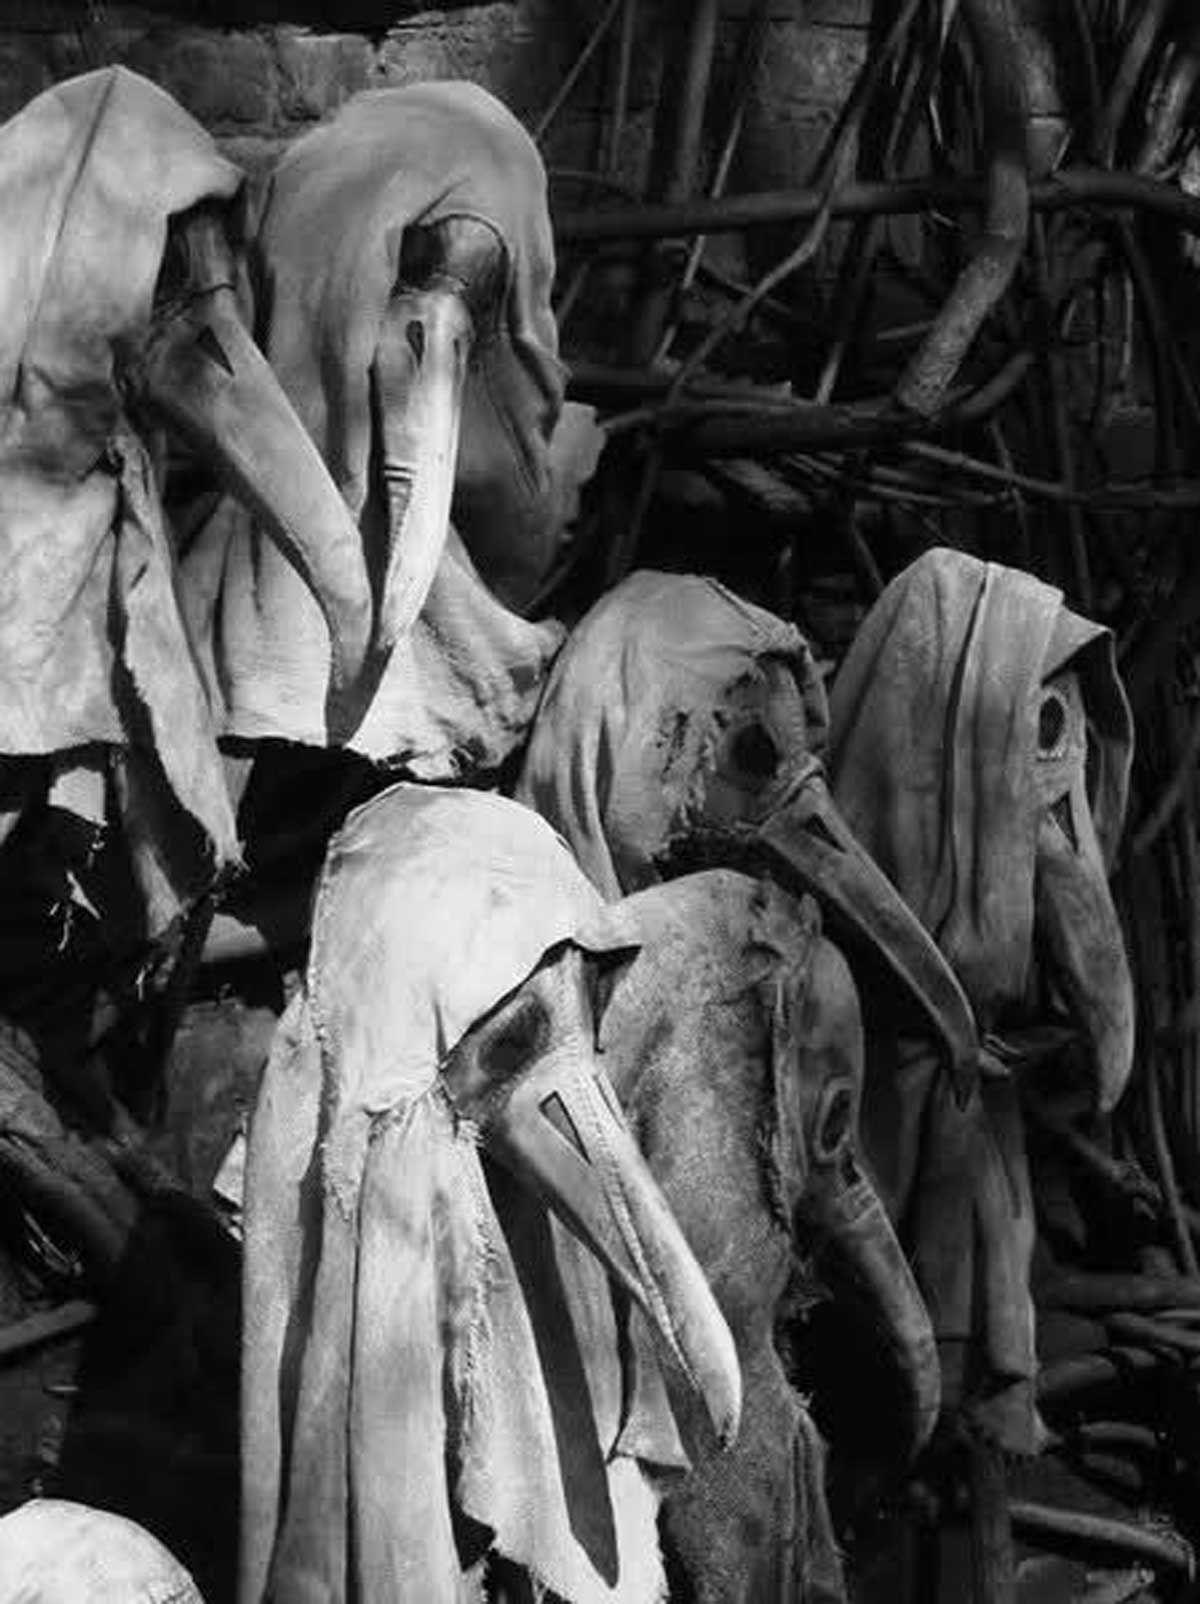 A Creepy Medical Tour Of The Past Plague Mask Creepy Plague Doctor